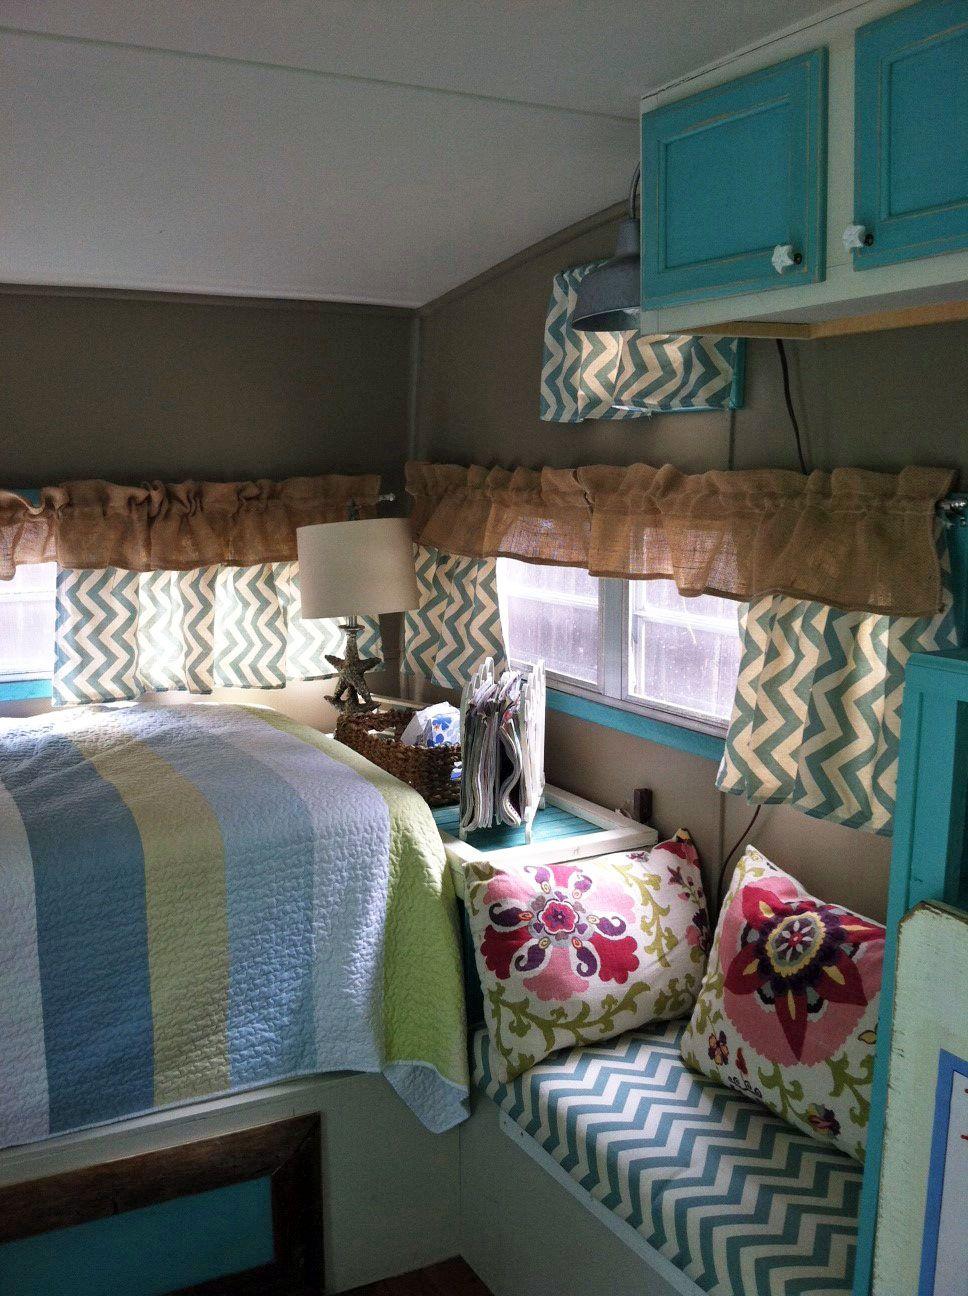 Diy rv interiors - 101 Camper Remodel Ideas